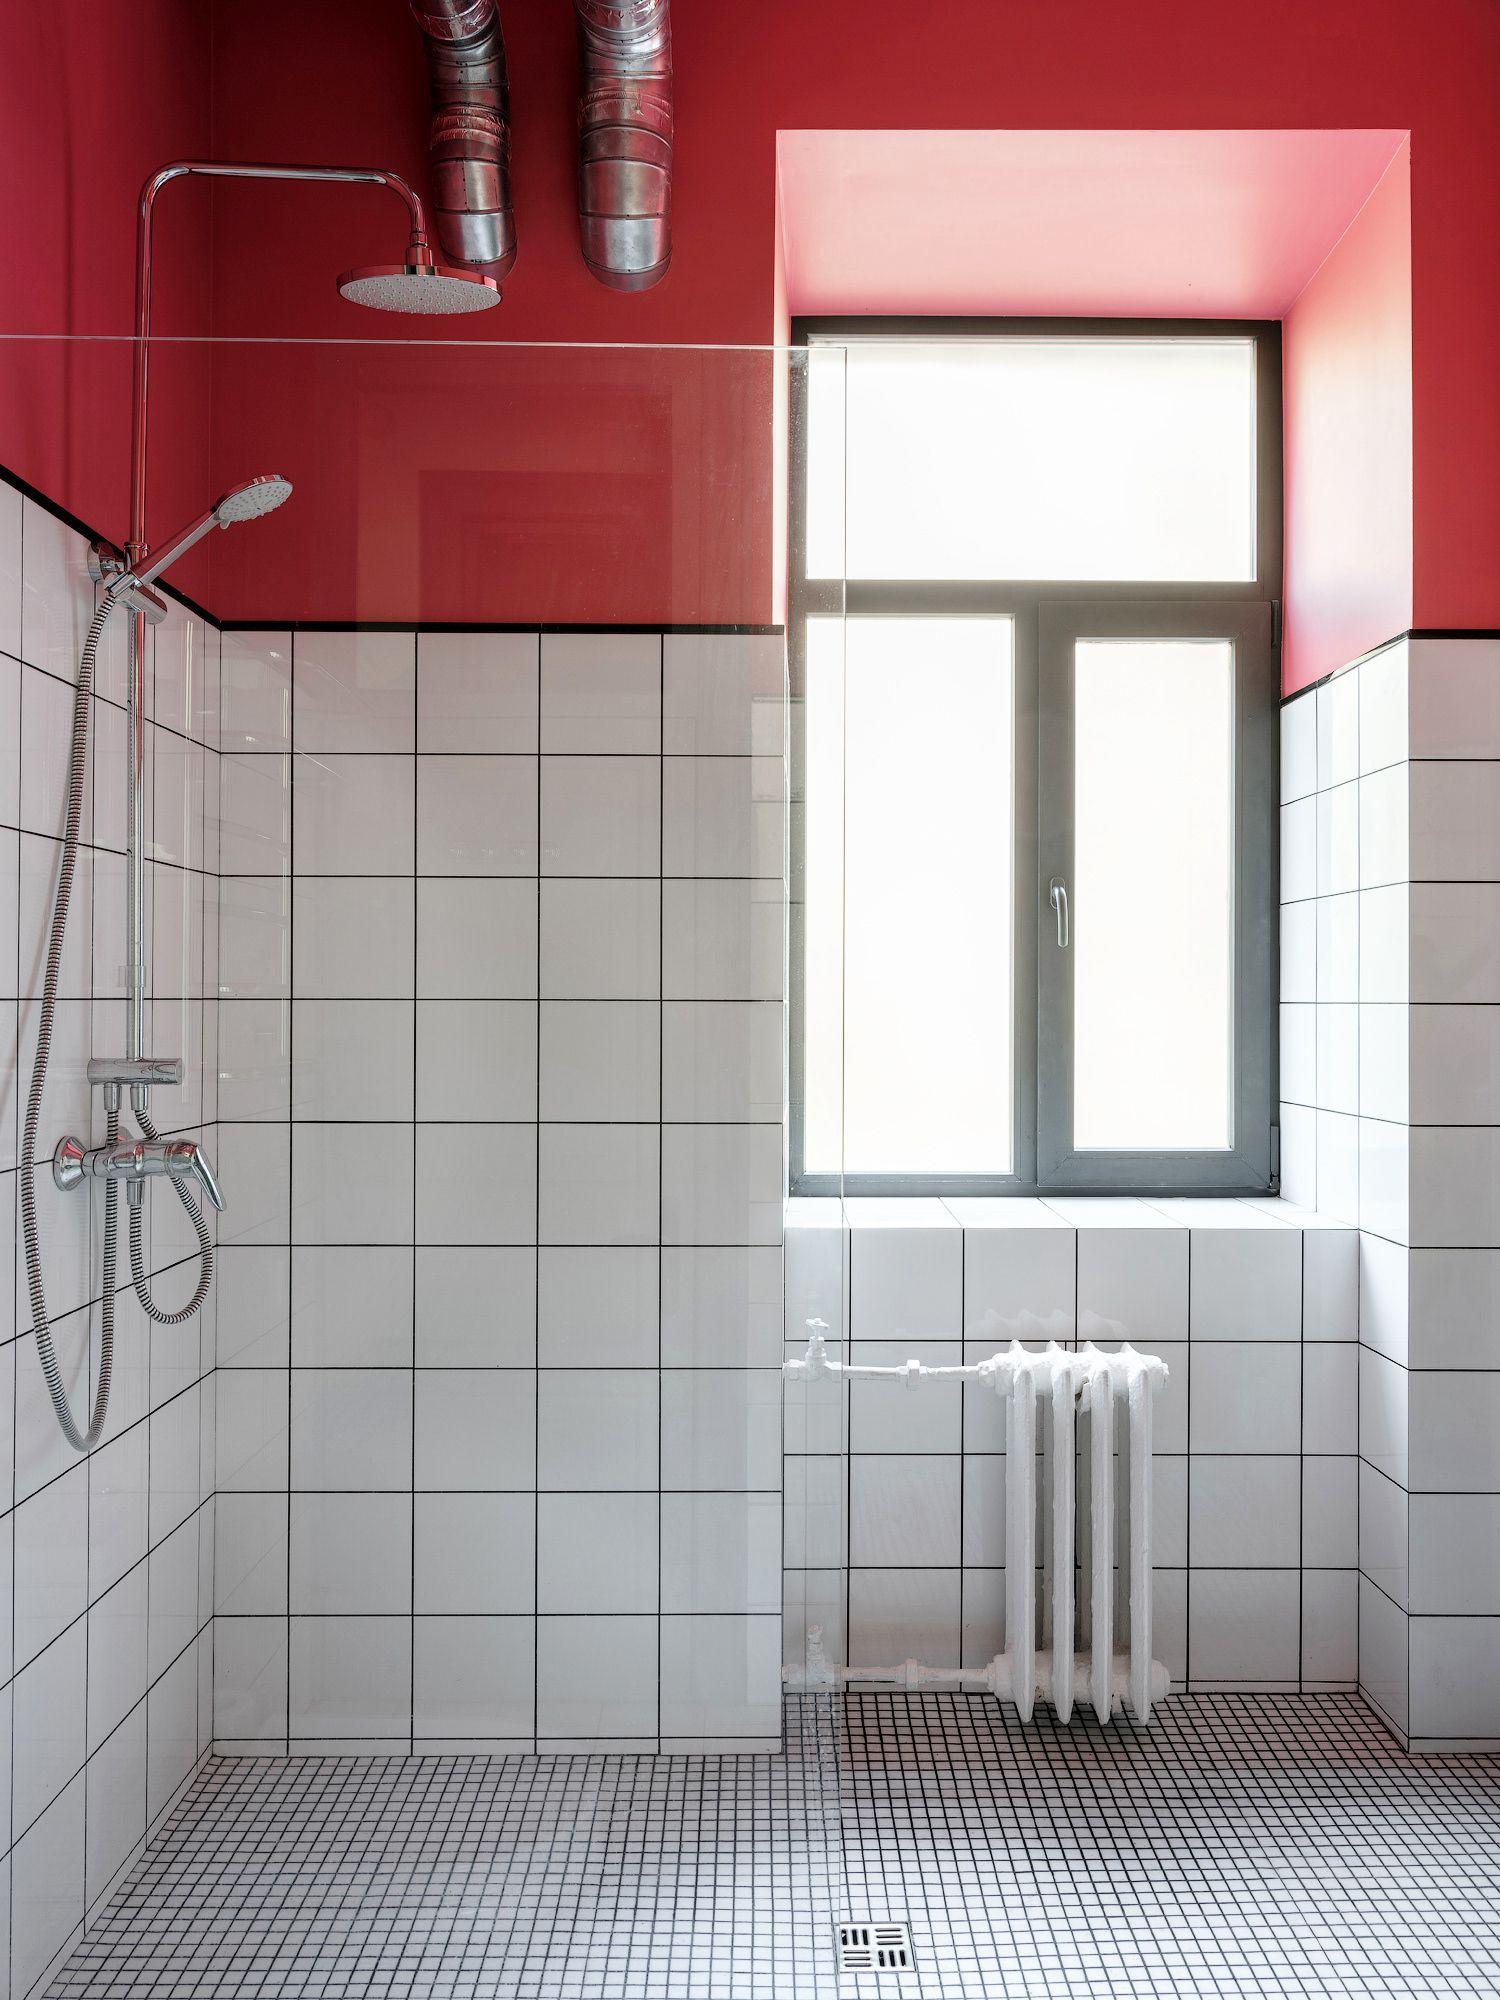 31 Design Ideas That Will Make Small Bathrooms Feel So ...